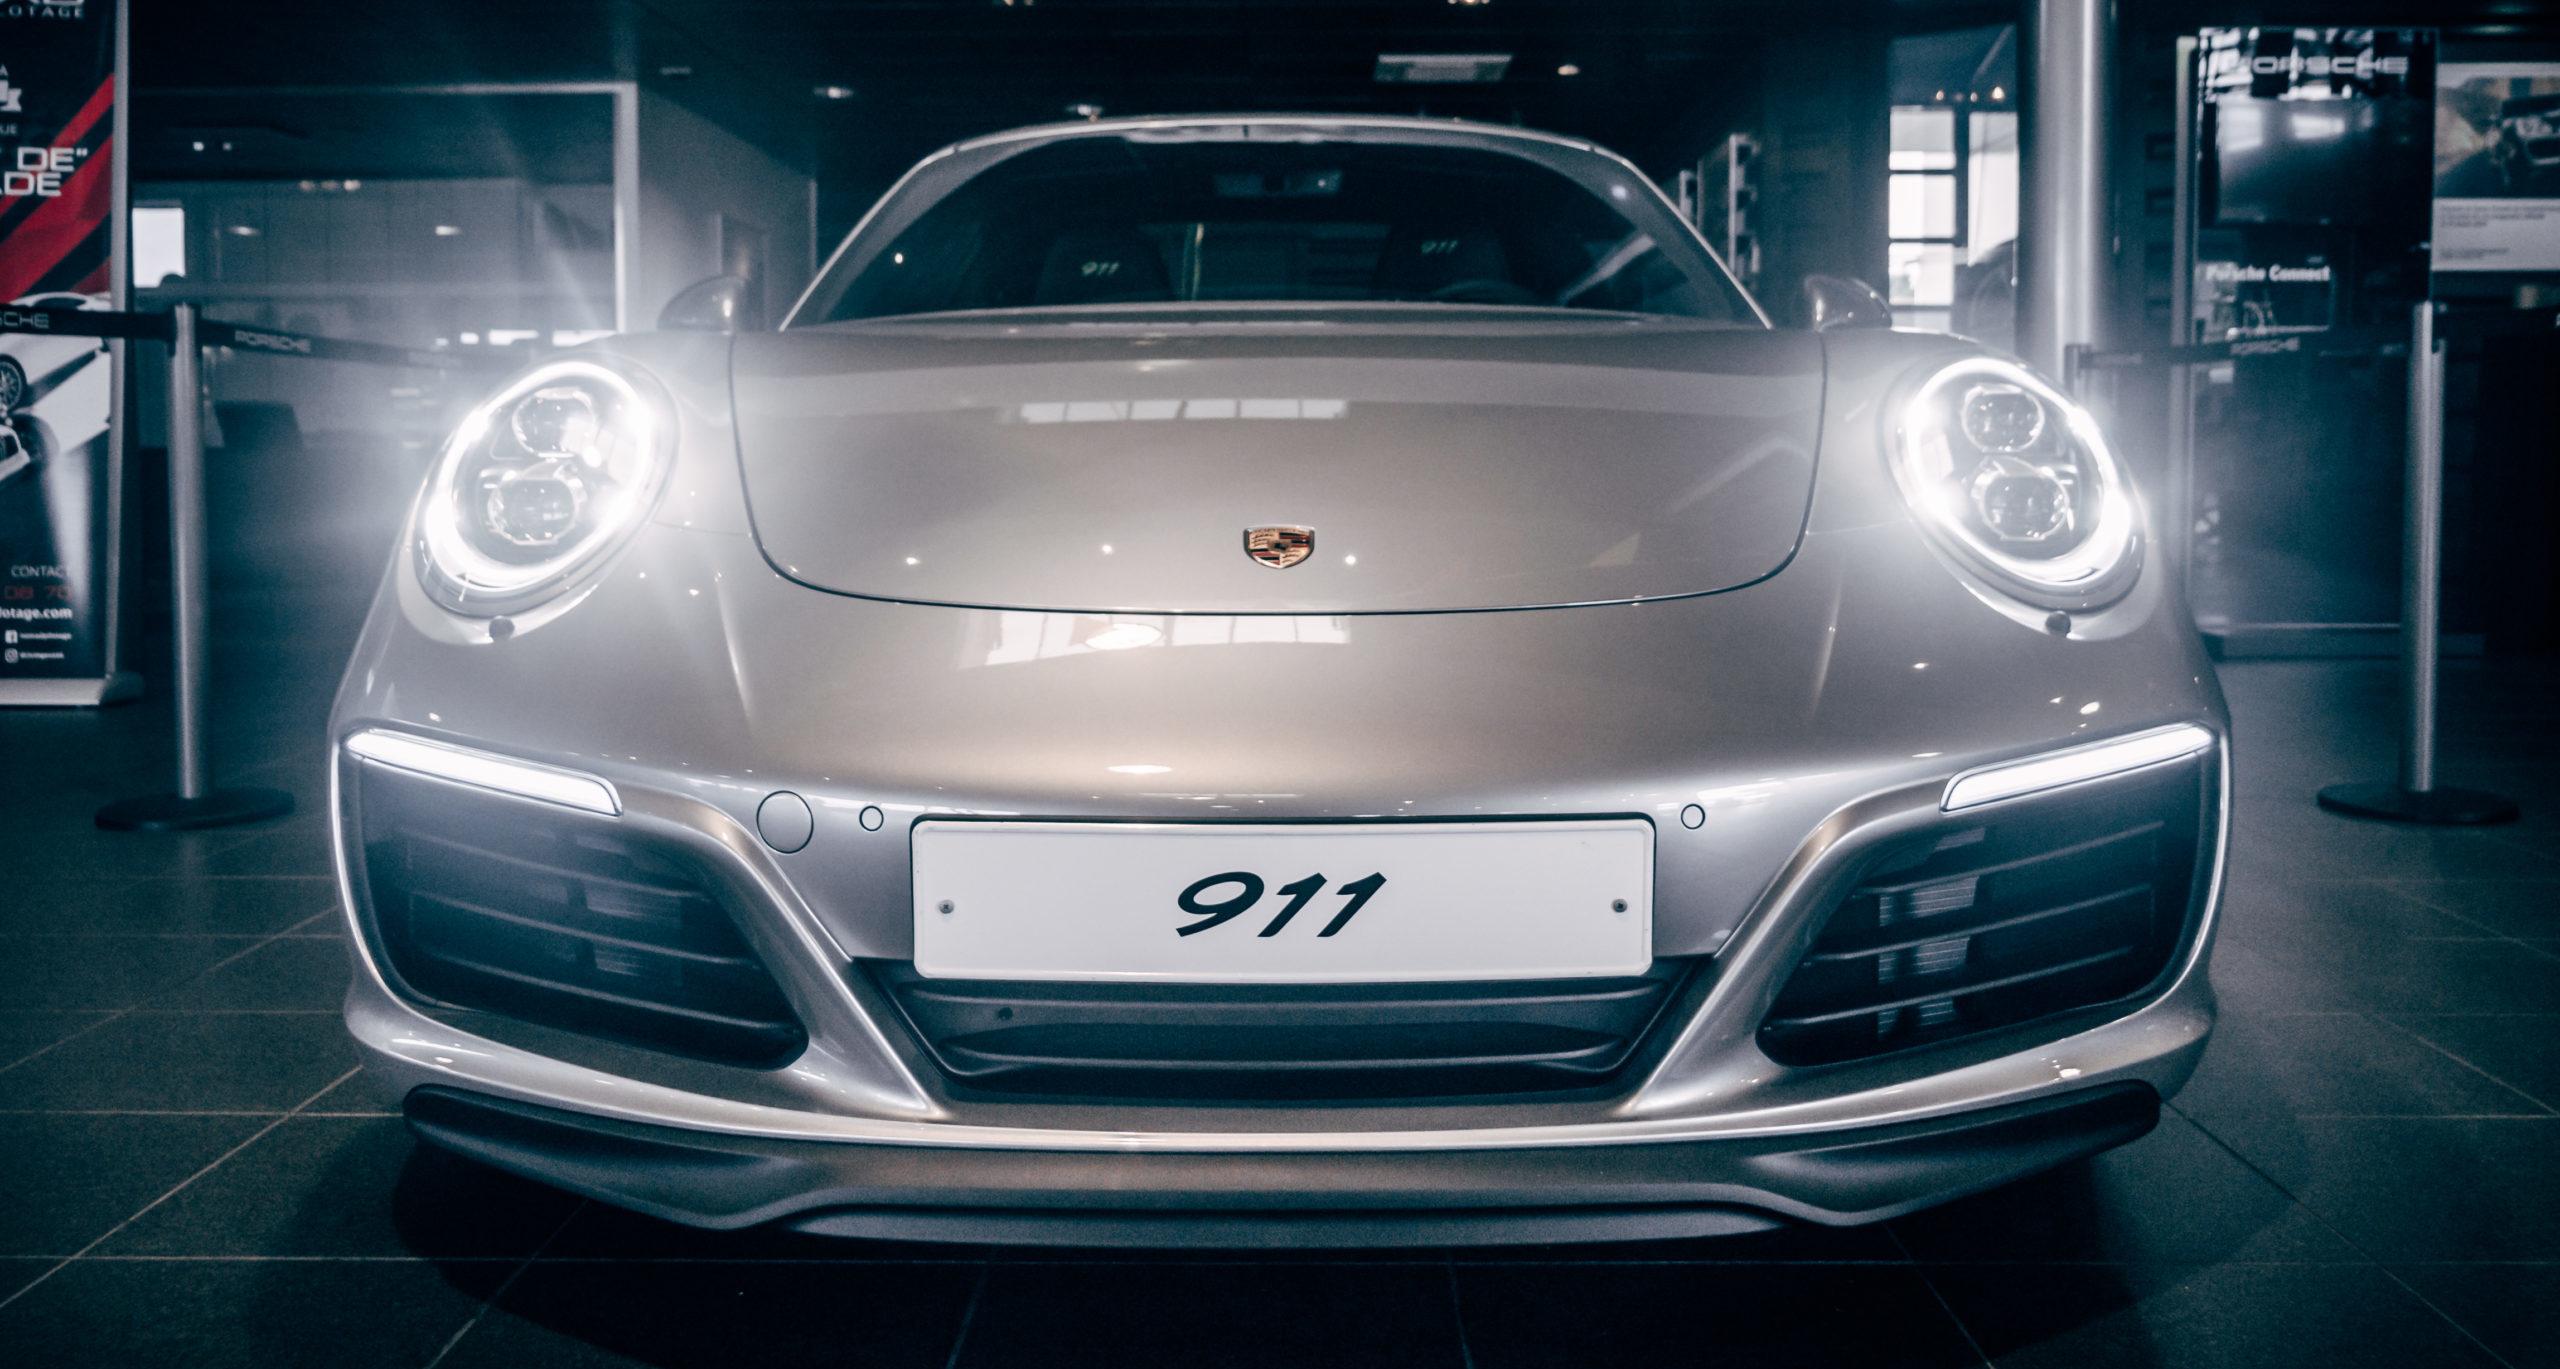 Centre Porsche Clermont-Ferrand